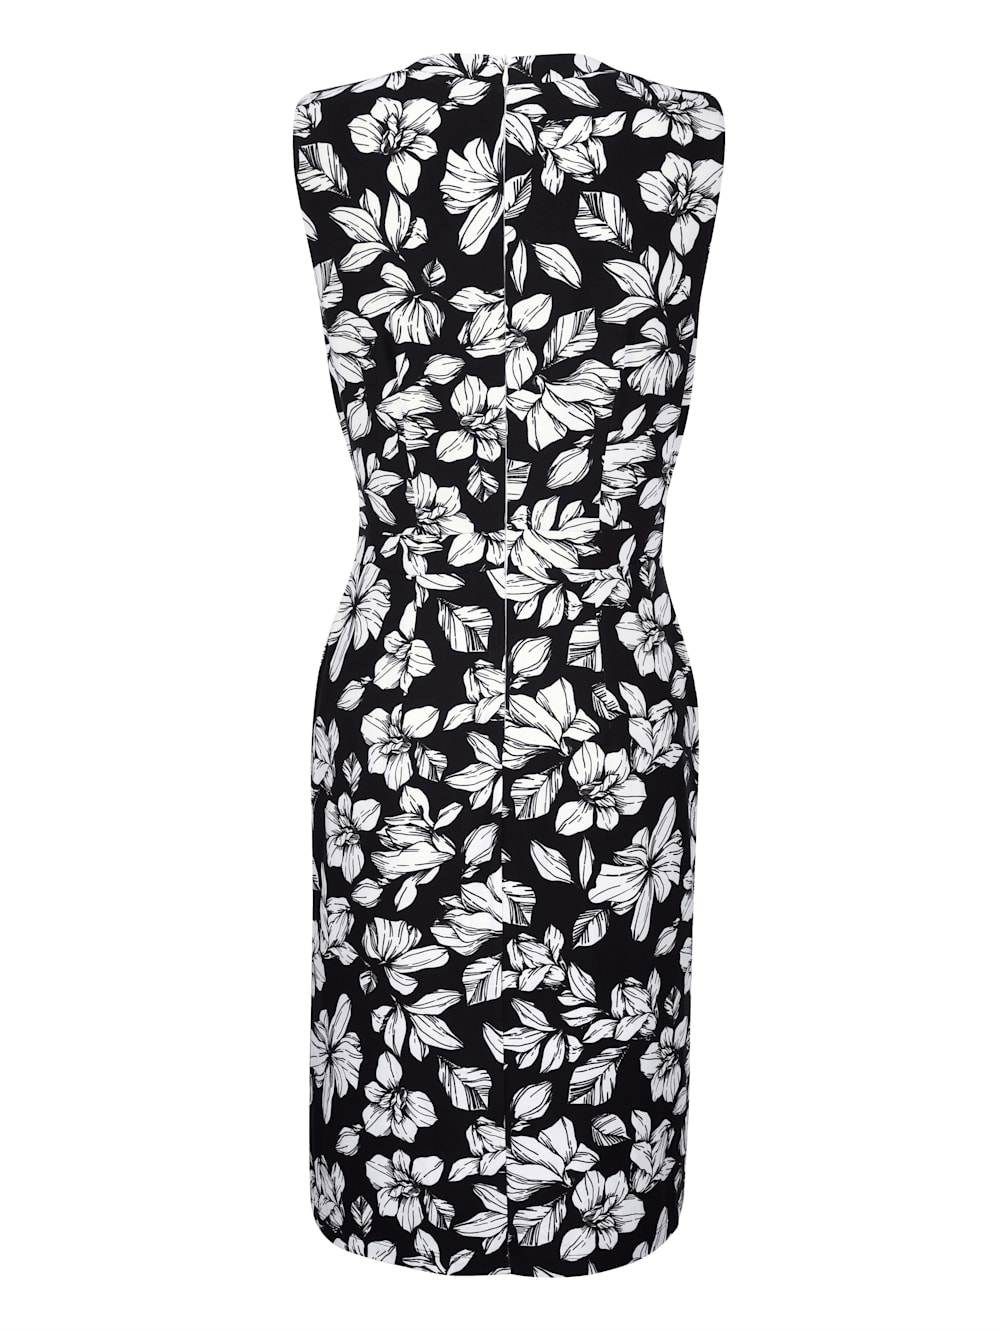 alba moda kleid im floralen dessin allover | alba moda